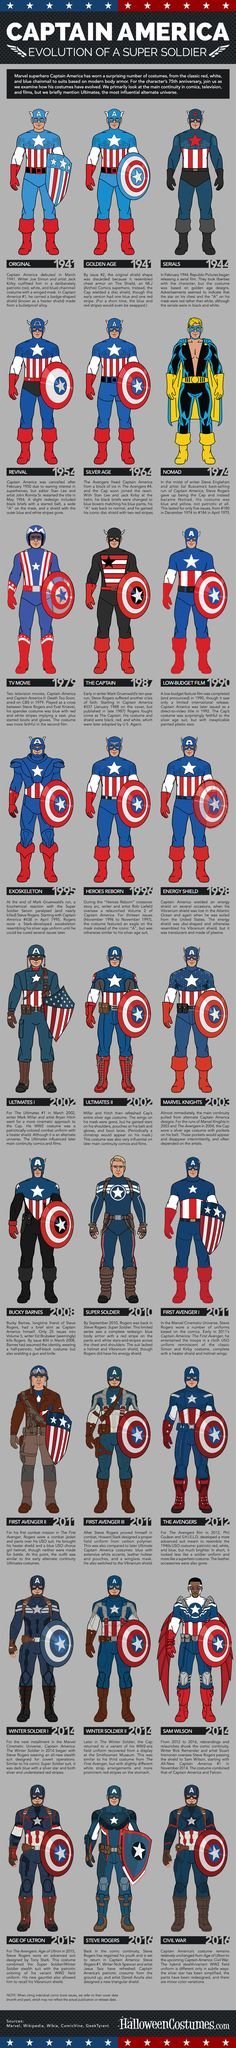 Captain America's costumes infographic